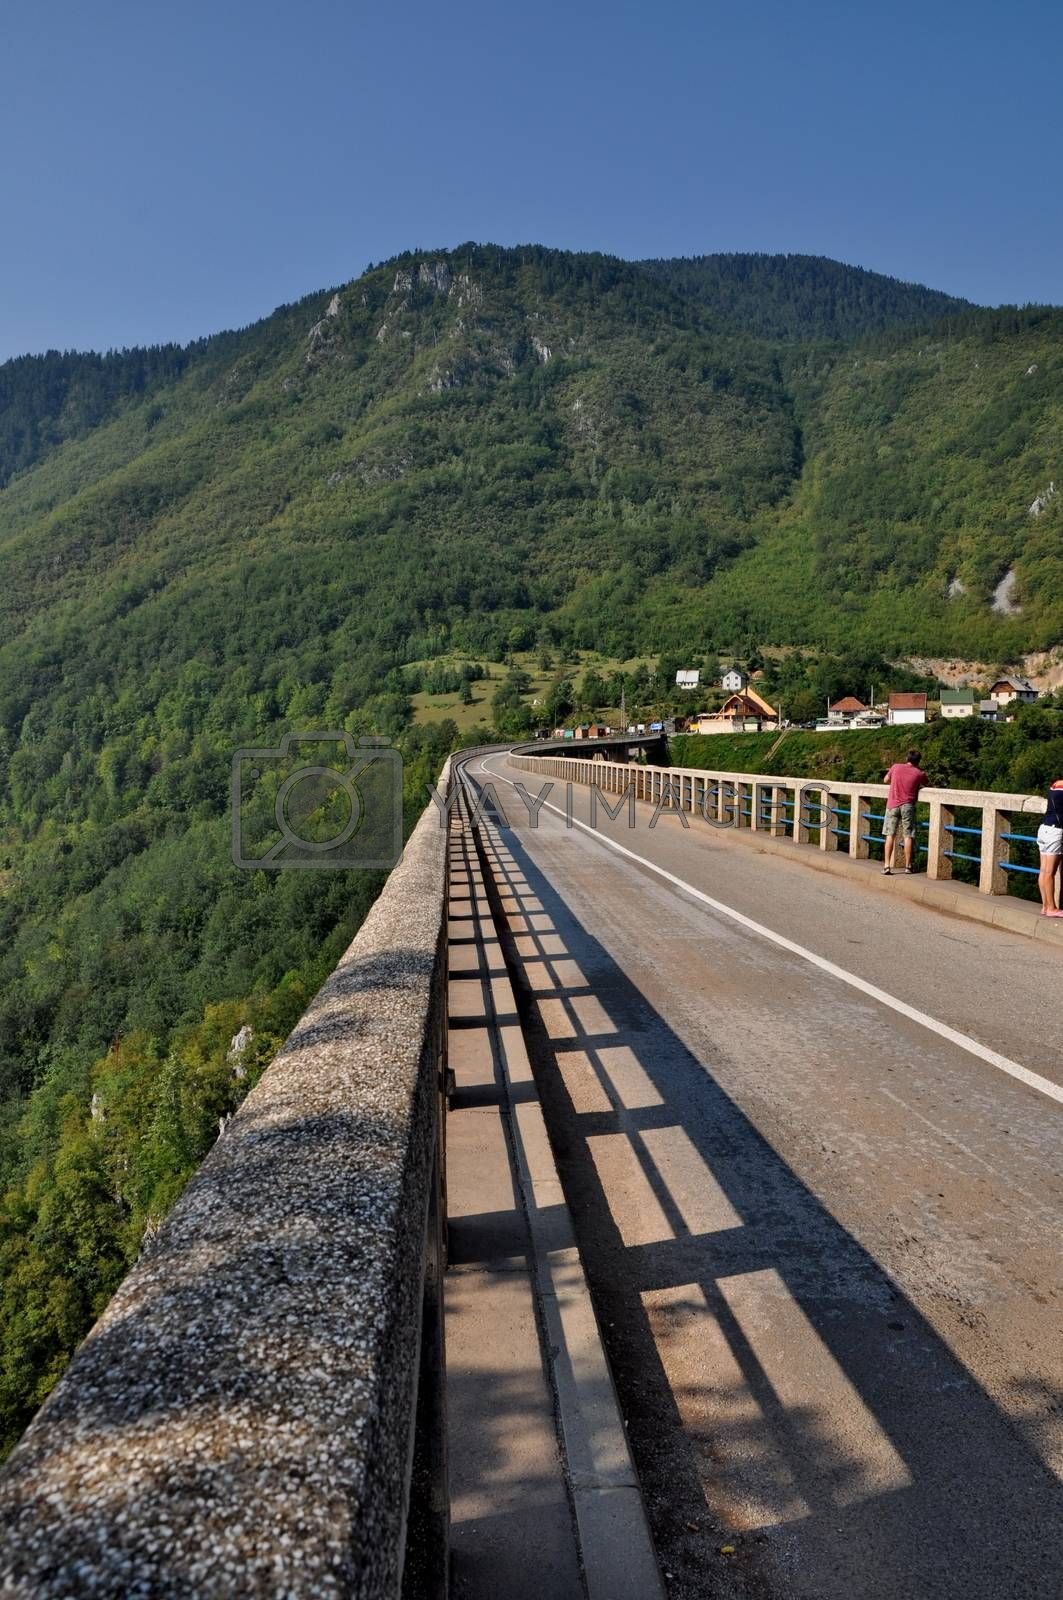 Royalty free image of Tara bridge in Monte Negro by anderm